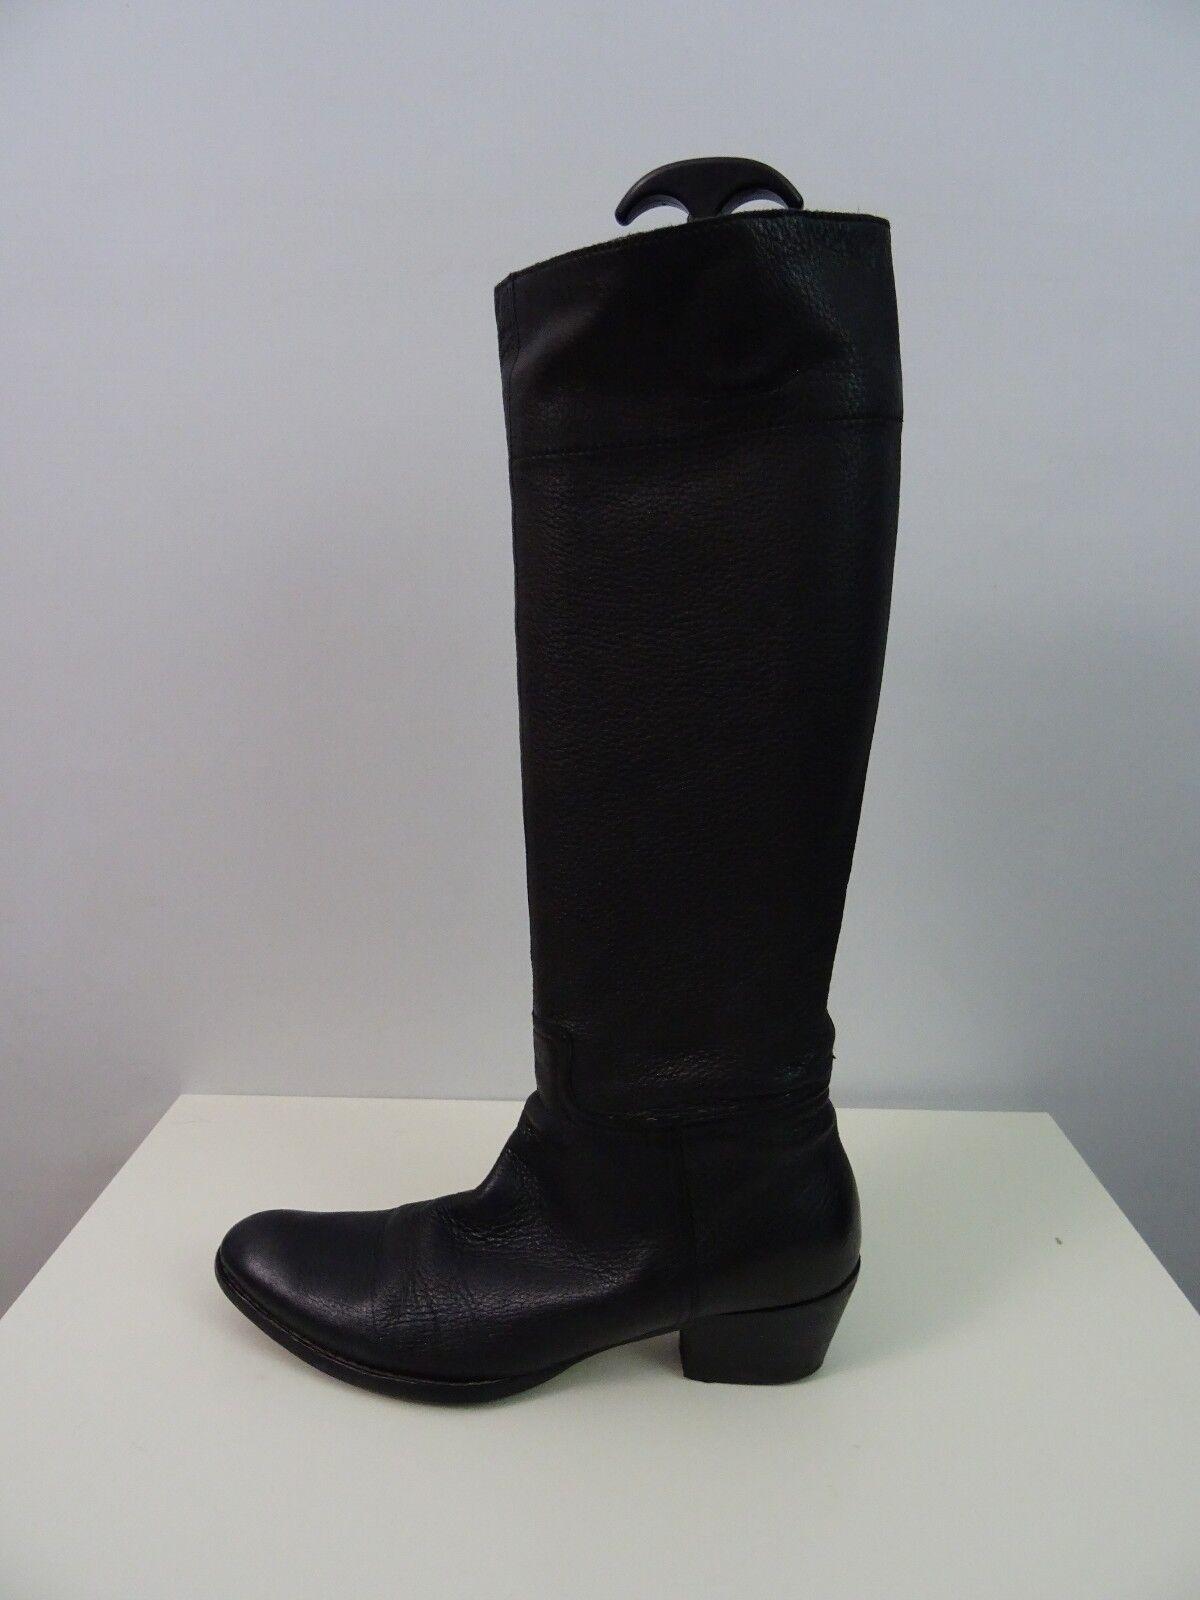 Miu Kniehoch  Miu Damen Stiefel Cowboystiefel Kniehoch Miu Schwarz Handschuhweiches Leder 39 9d9b00